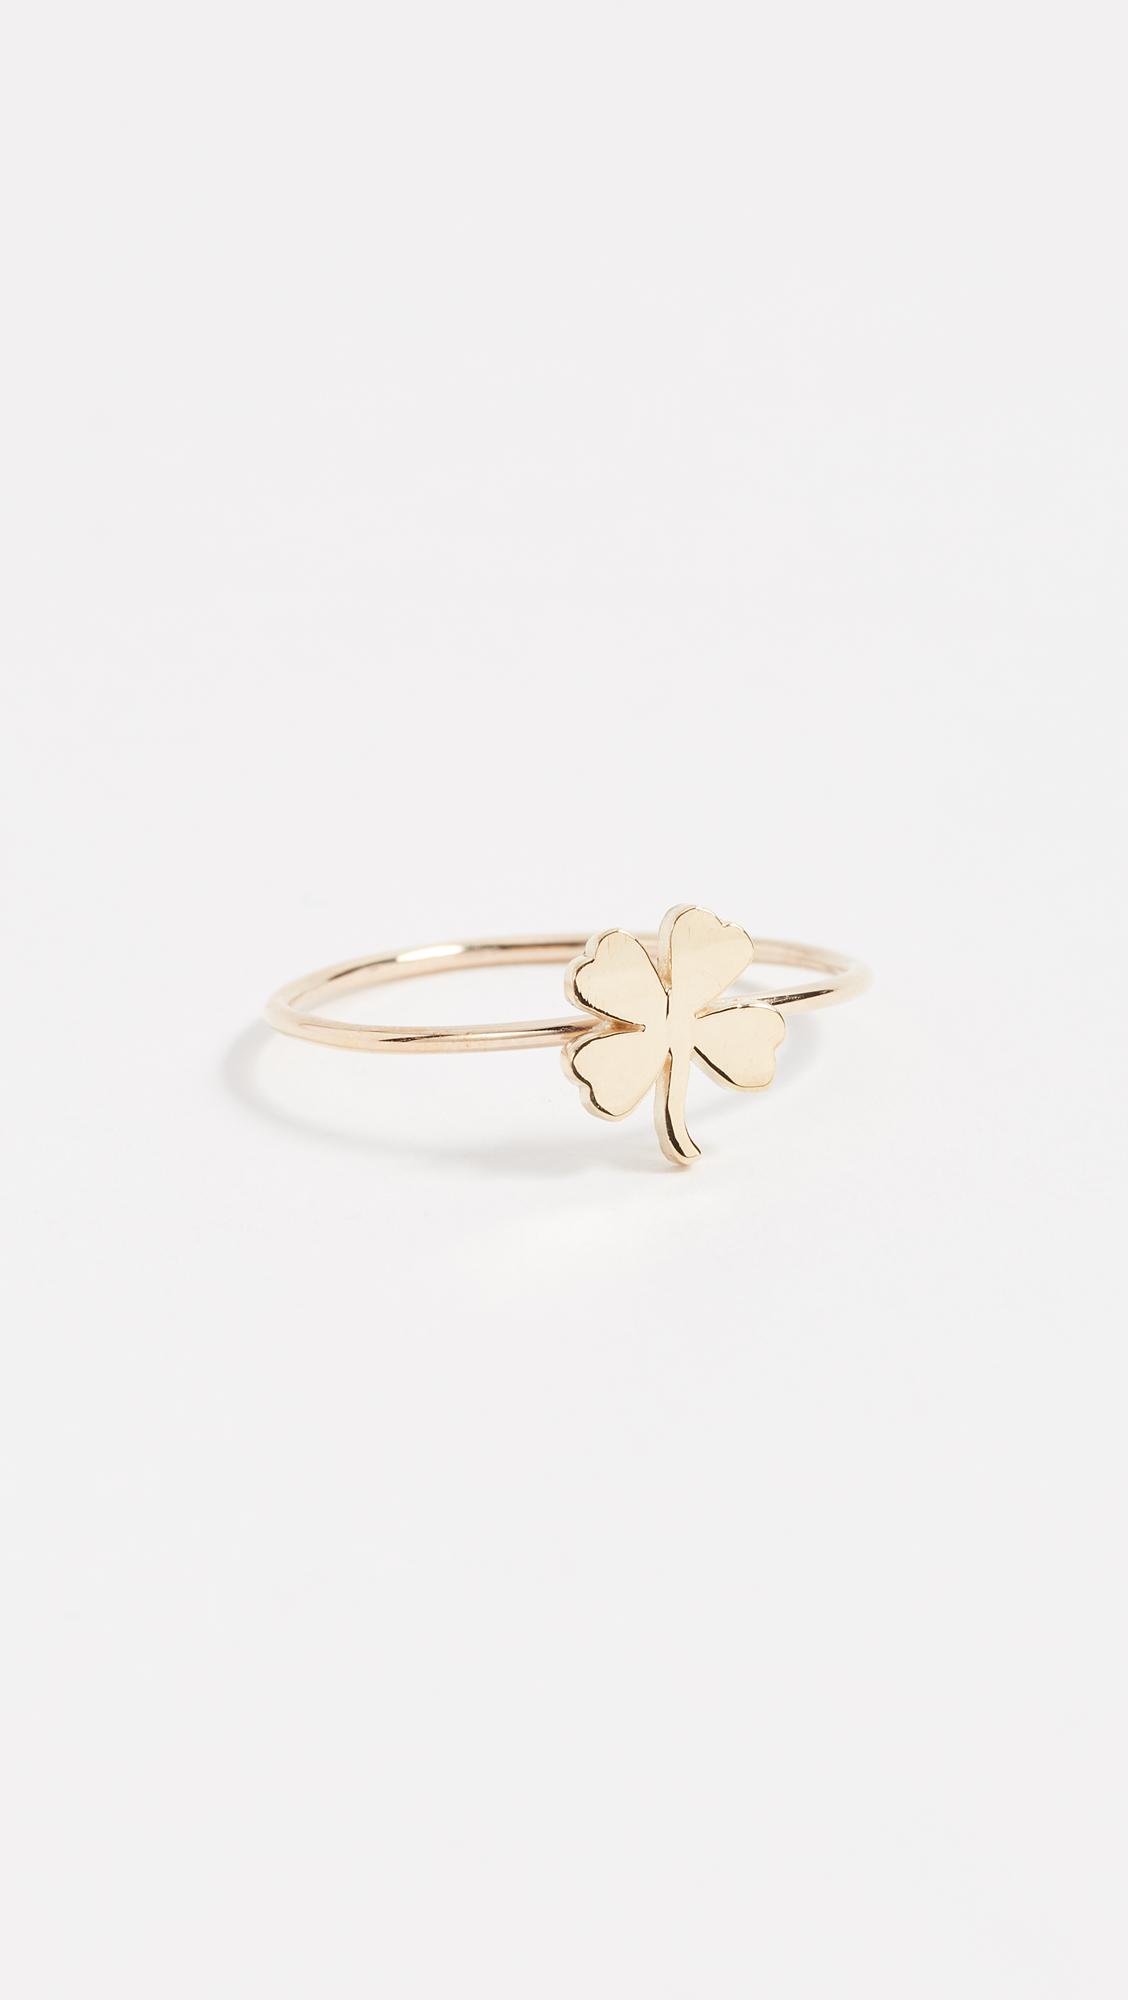 f380e7f35c0fb2 Jennifer Meyer Jewelry 18k Gold Mini Clover Ring   SHOPBOP